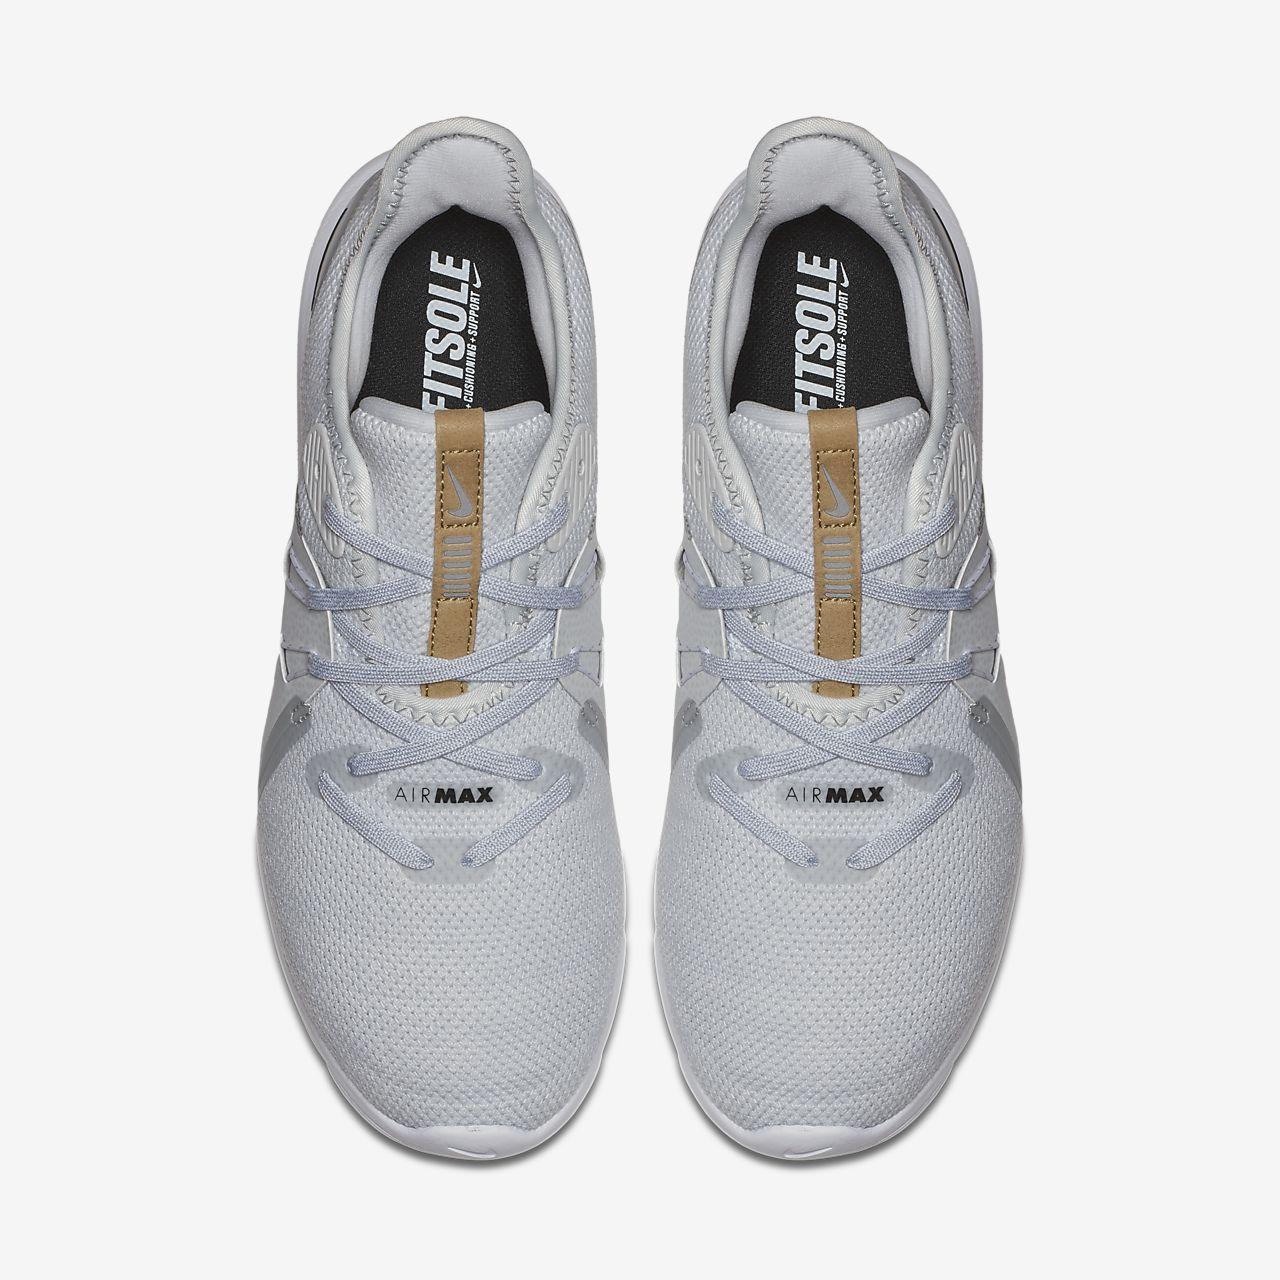 best sneakers 5af87 2d5fa ... Sko Nike Air Max Sequent 3 för kvinnor